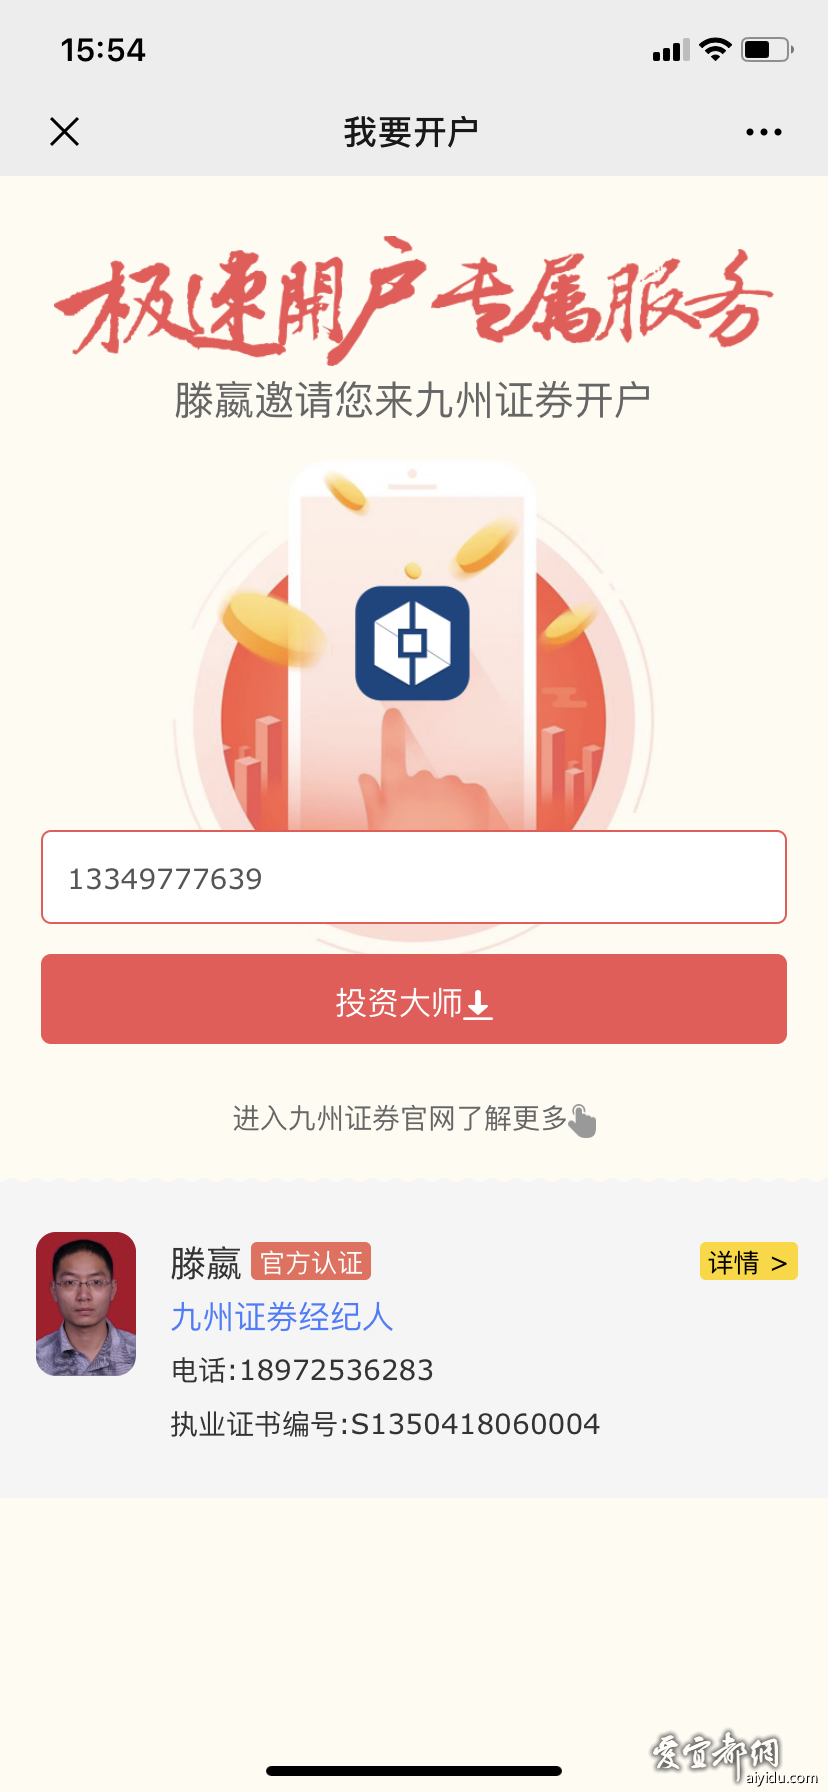 QQ图片20200416155713.png